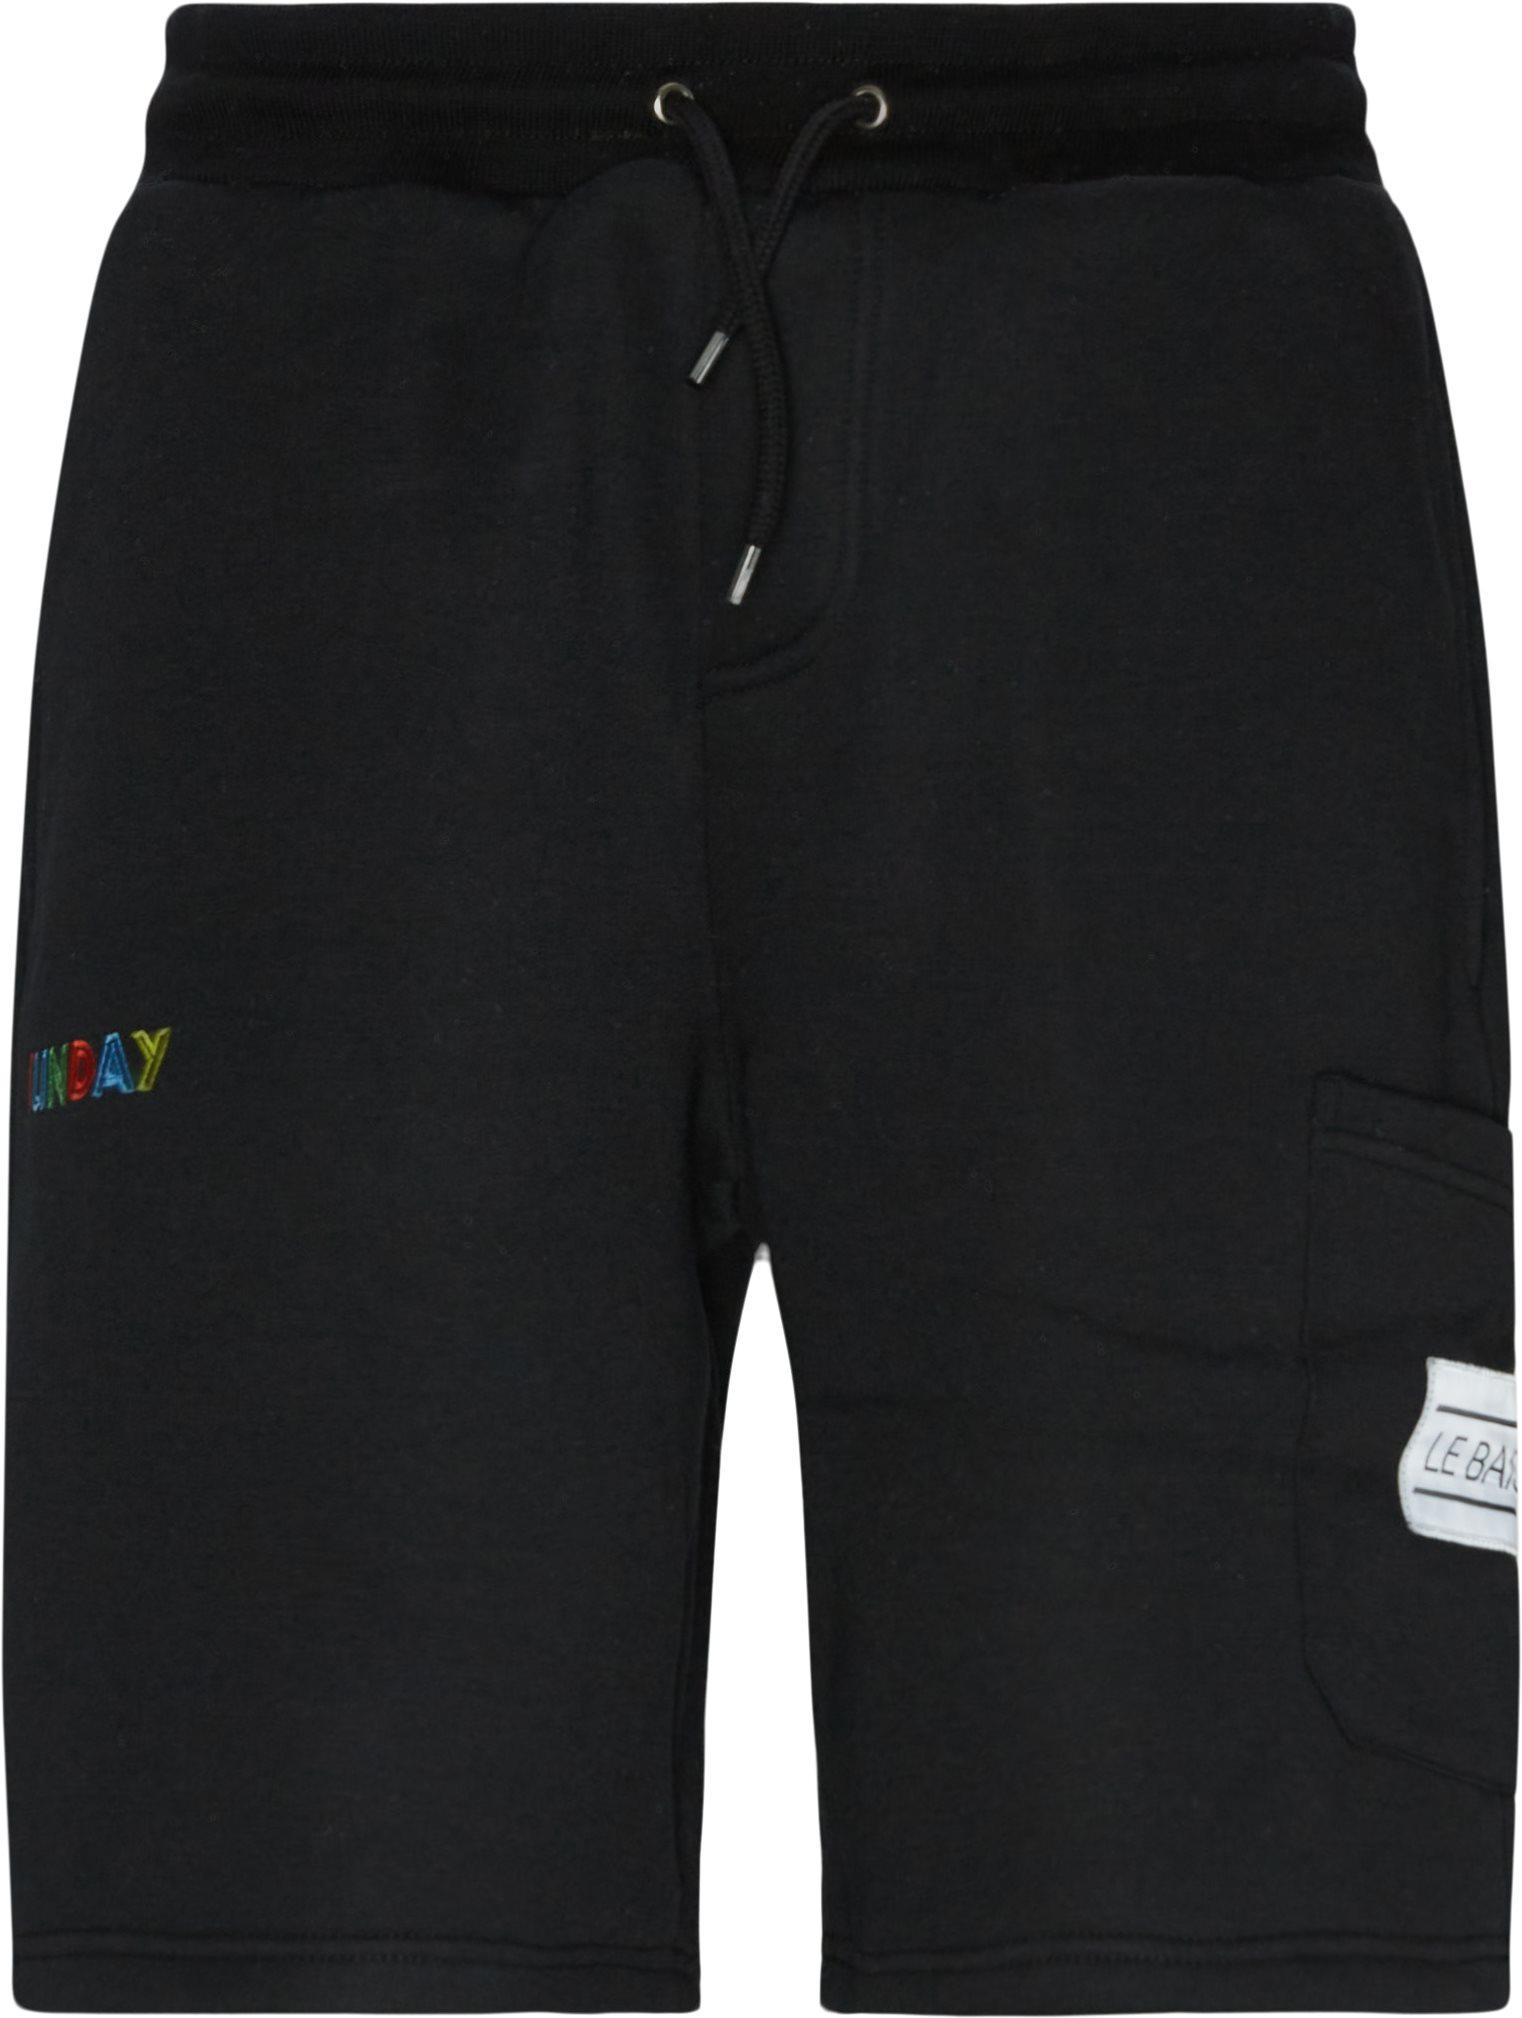 Shorts - Regular fit - Svart